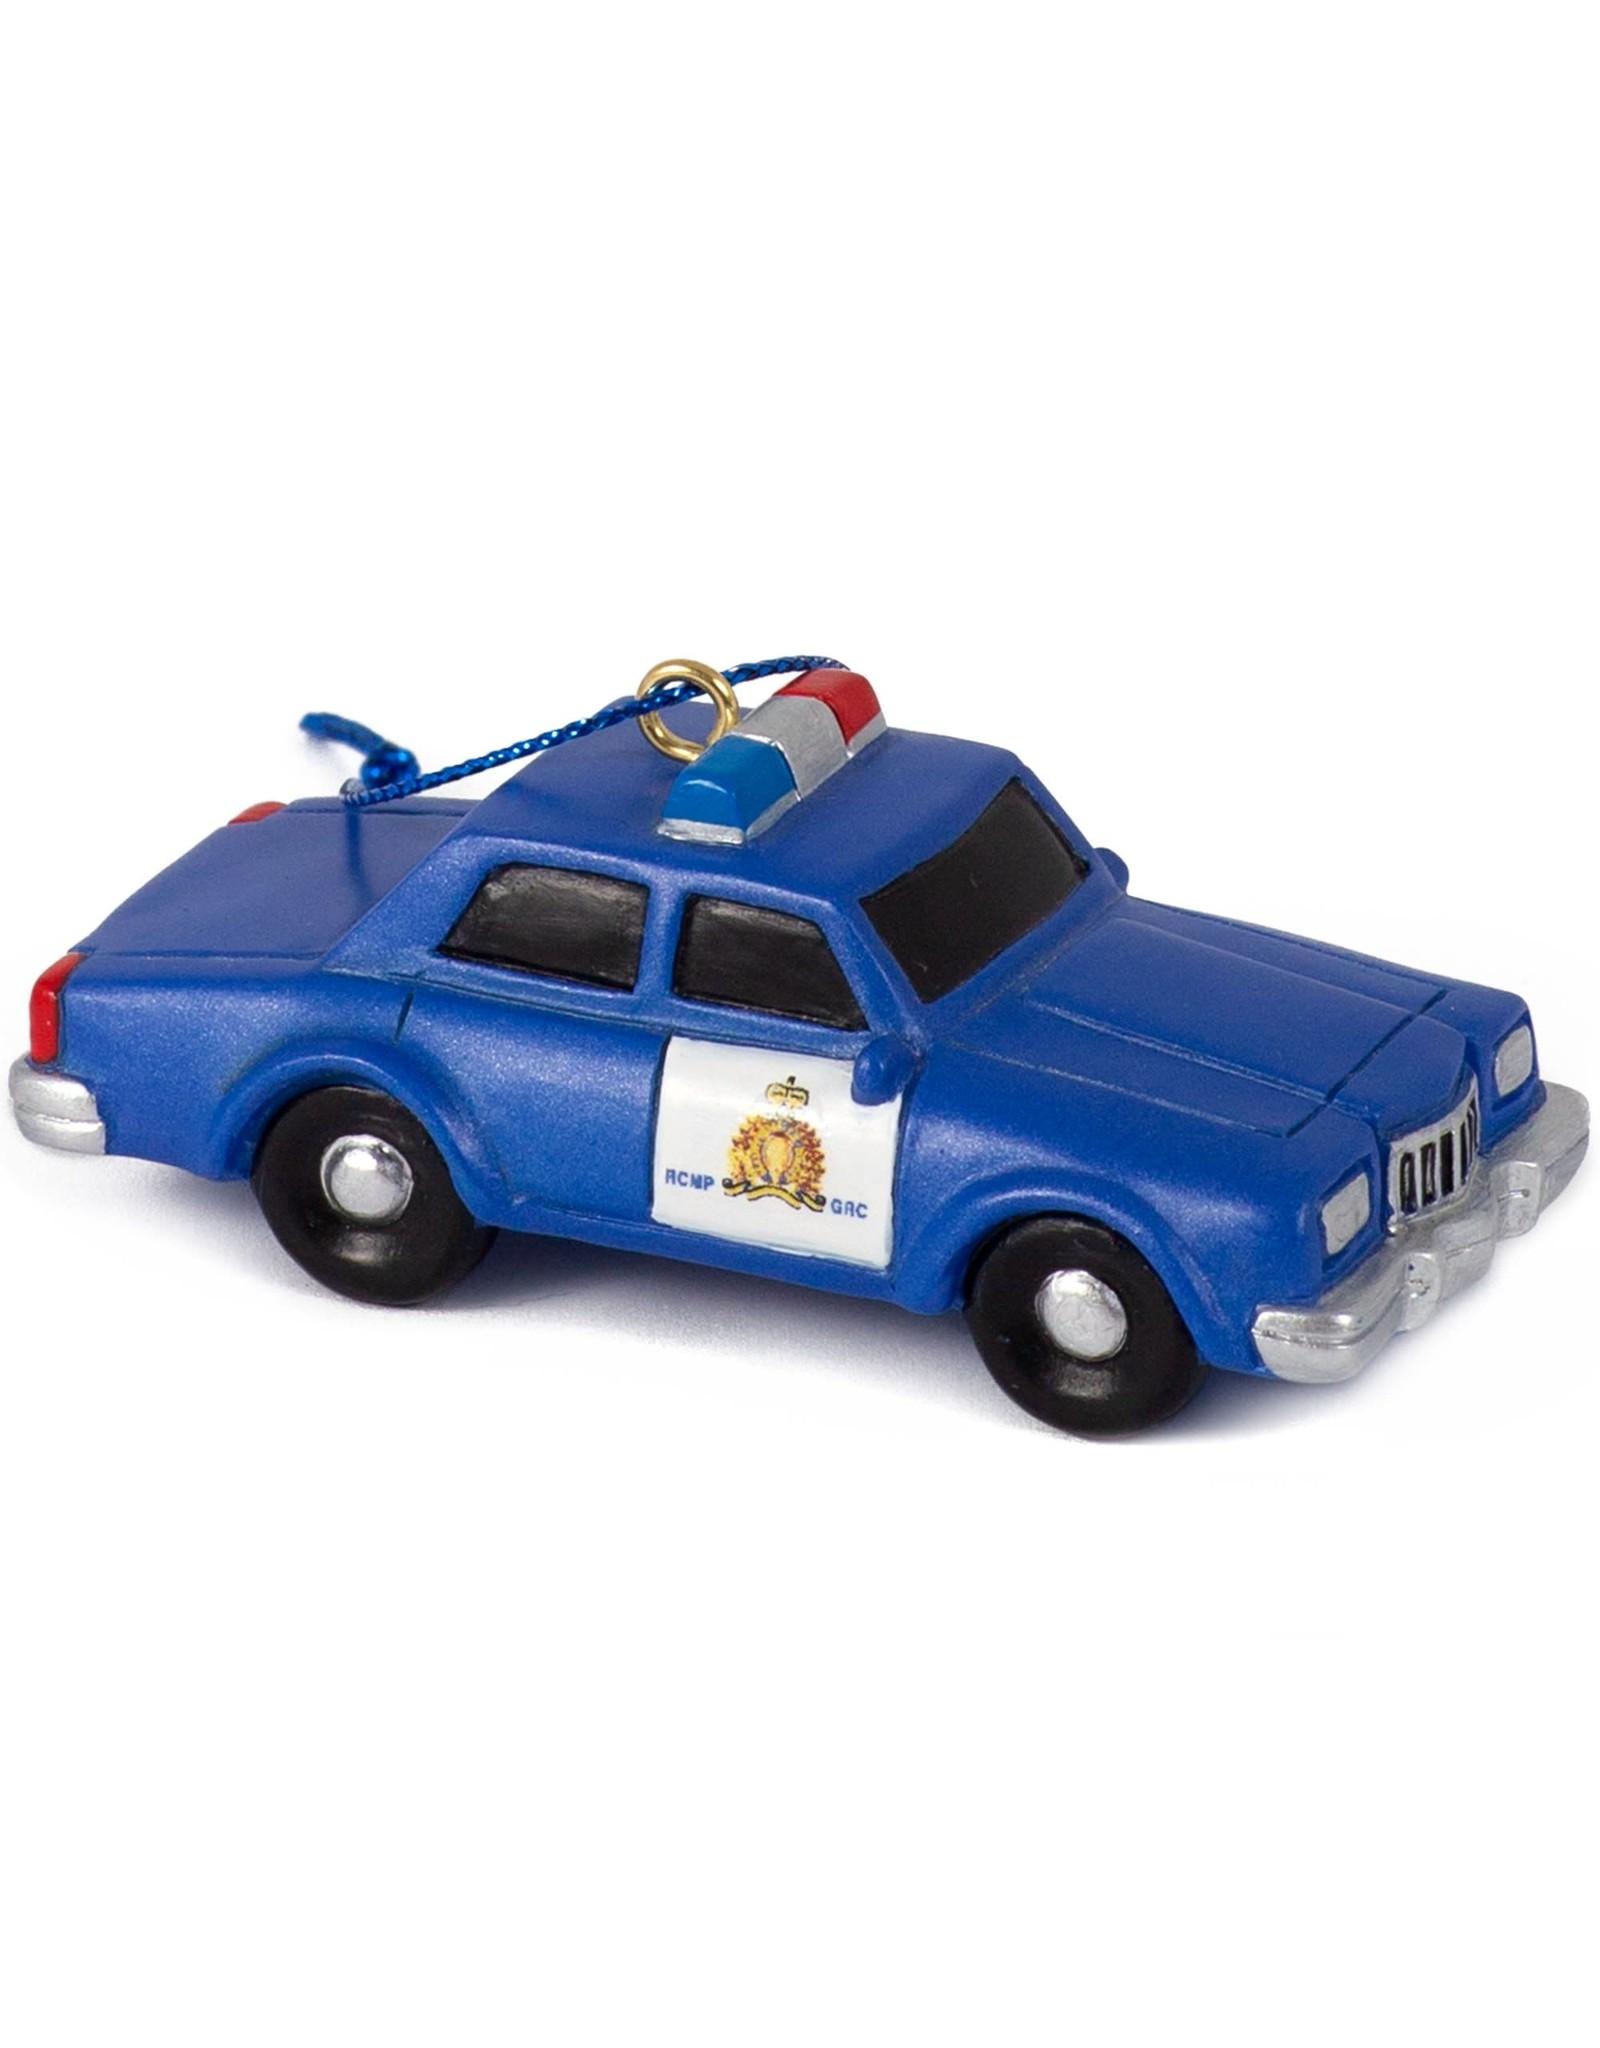 Main & Local RCMP Retro Patrol Car Ornament